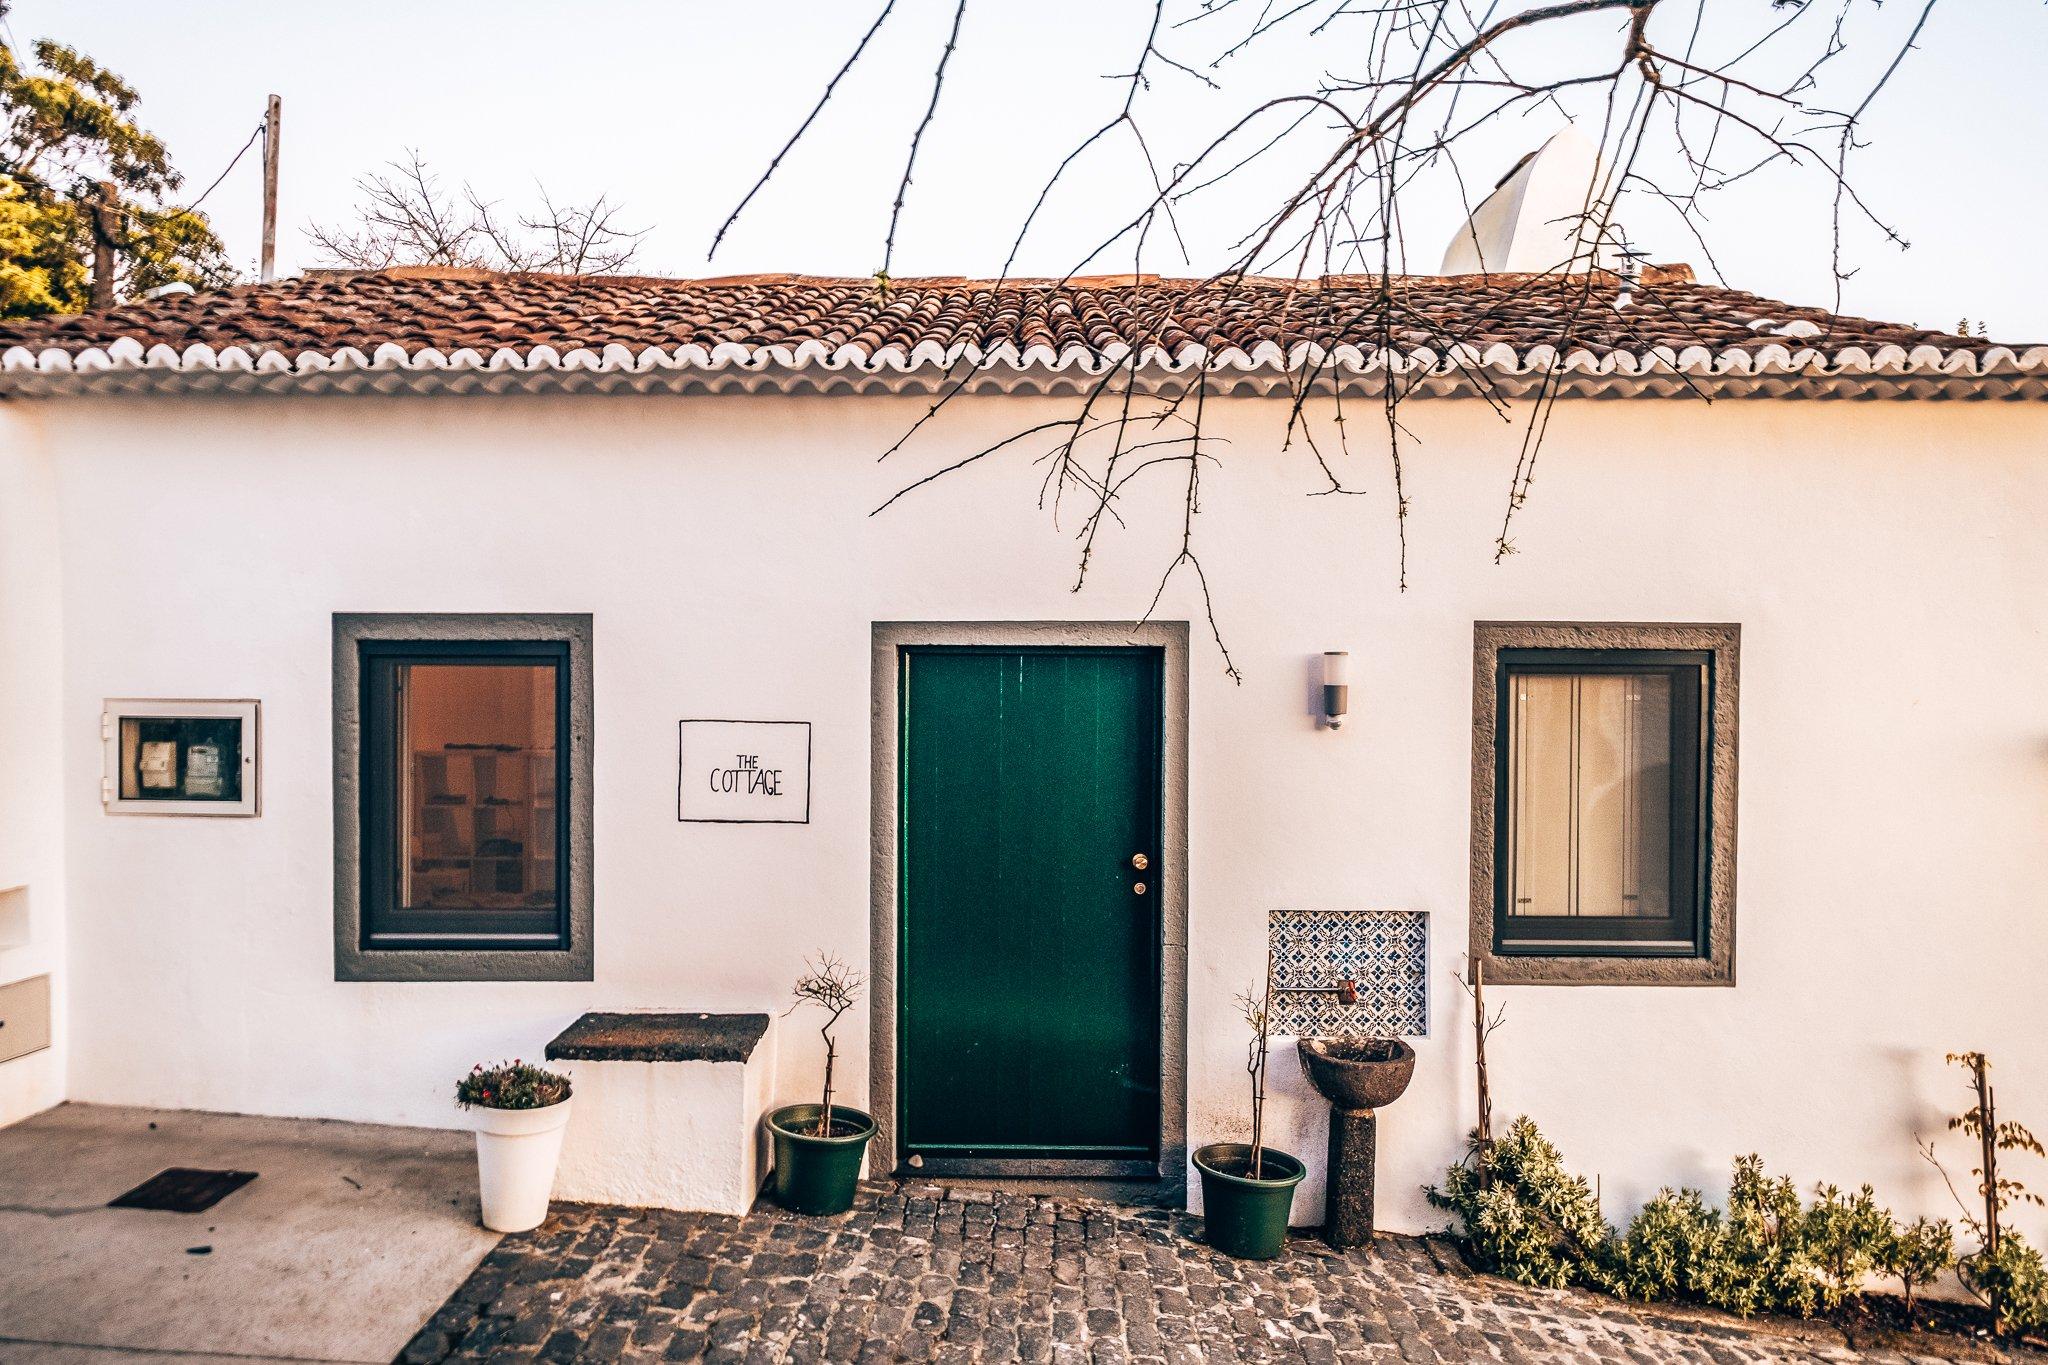 De cottage van Solar Branco Eco Estate, Azoren, Alles over gin.